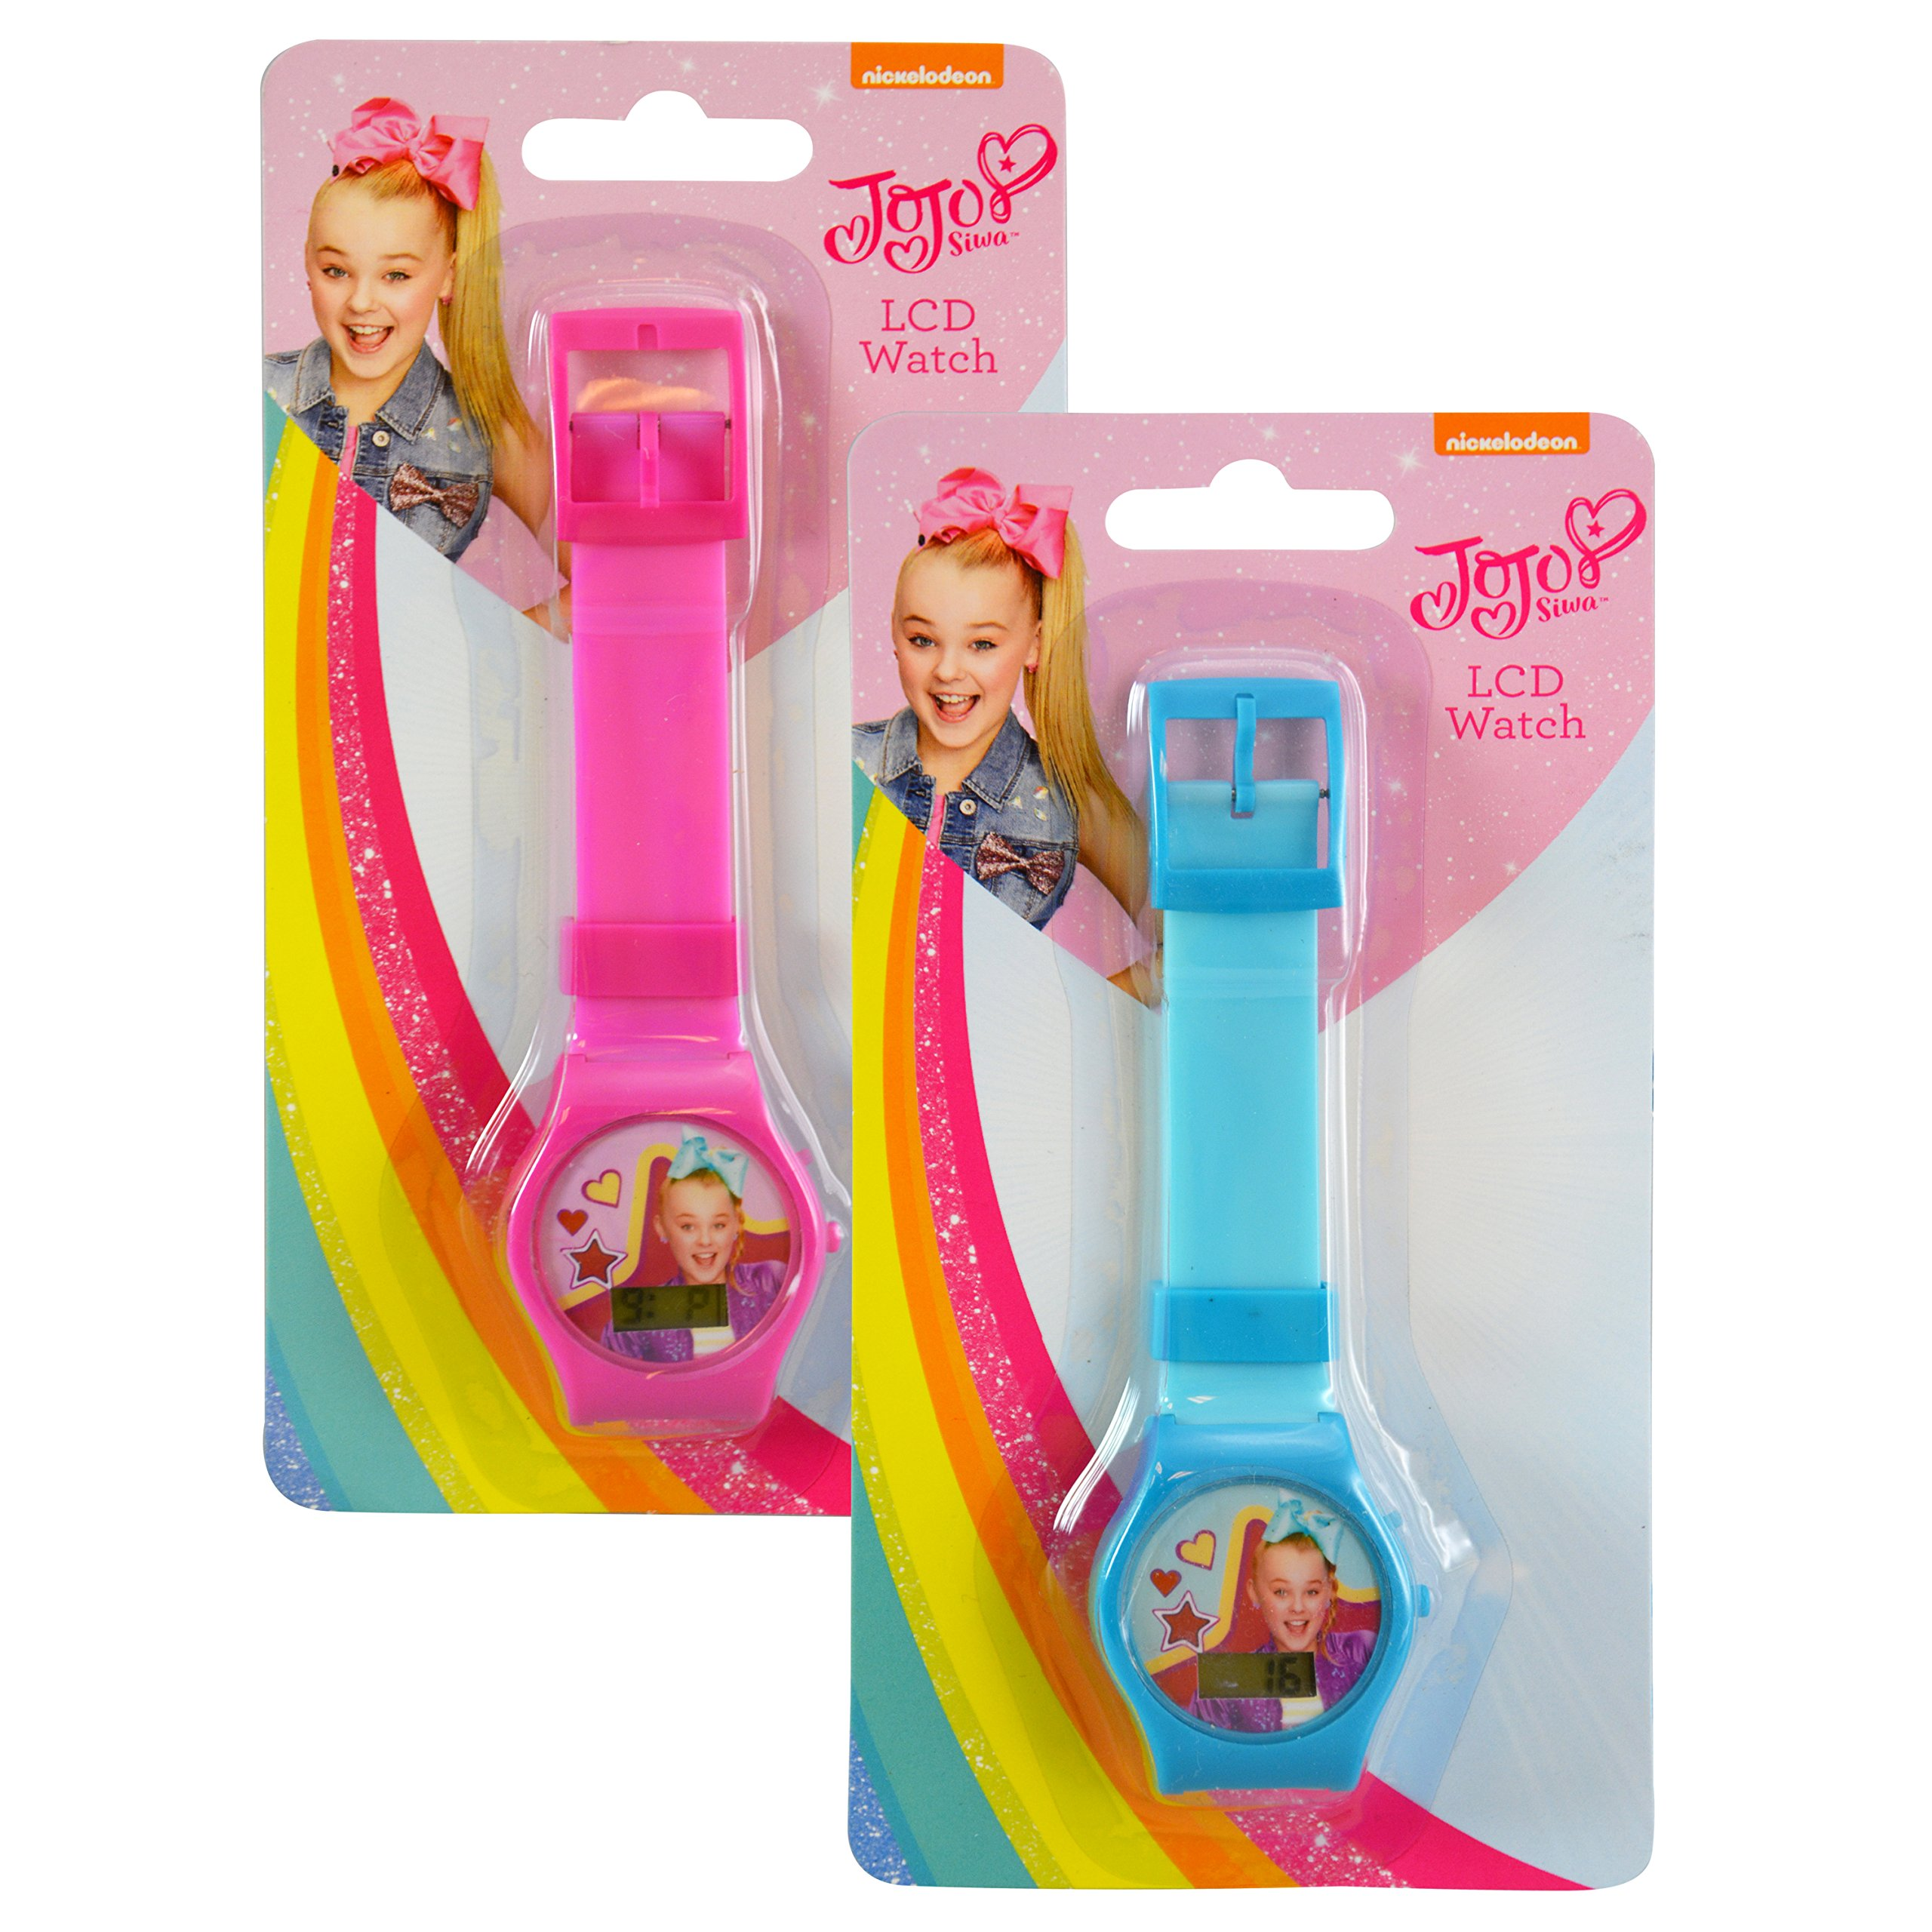 JoJo Siwa Travel Fun Set, Digital Watch and 2pk Kids Toothbrush with Travel Sling Bag by JoJo Siwa (Image #3)